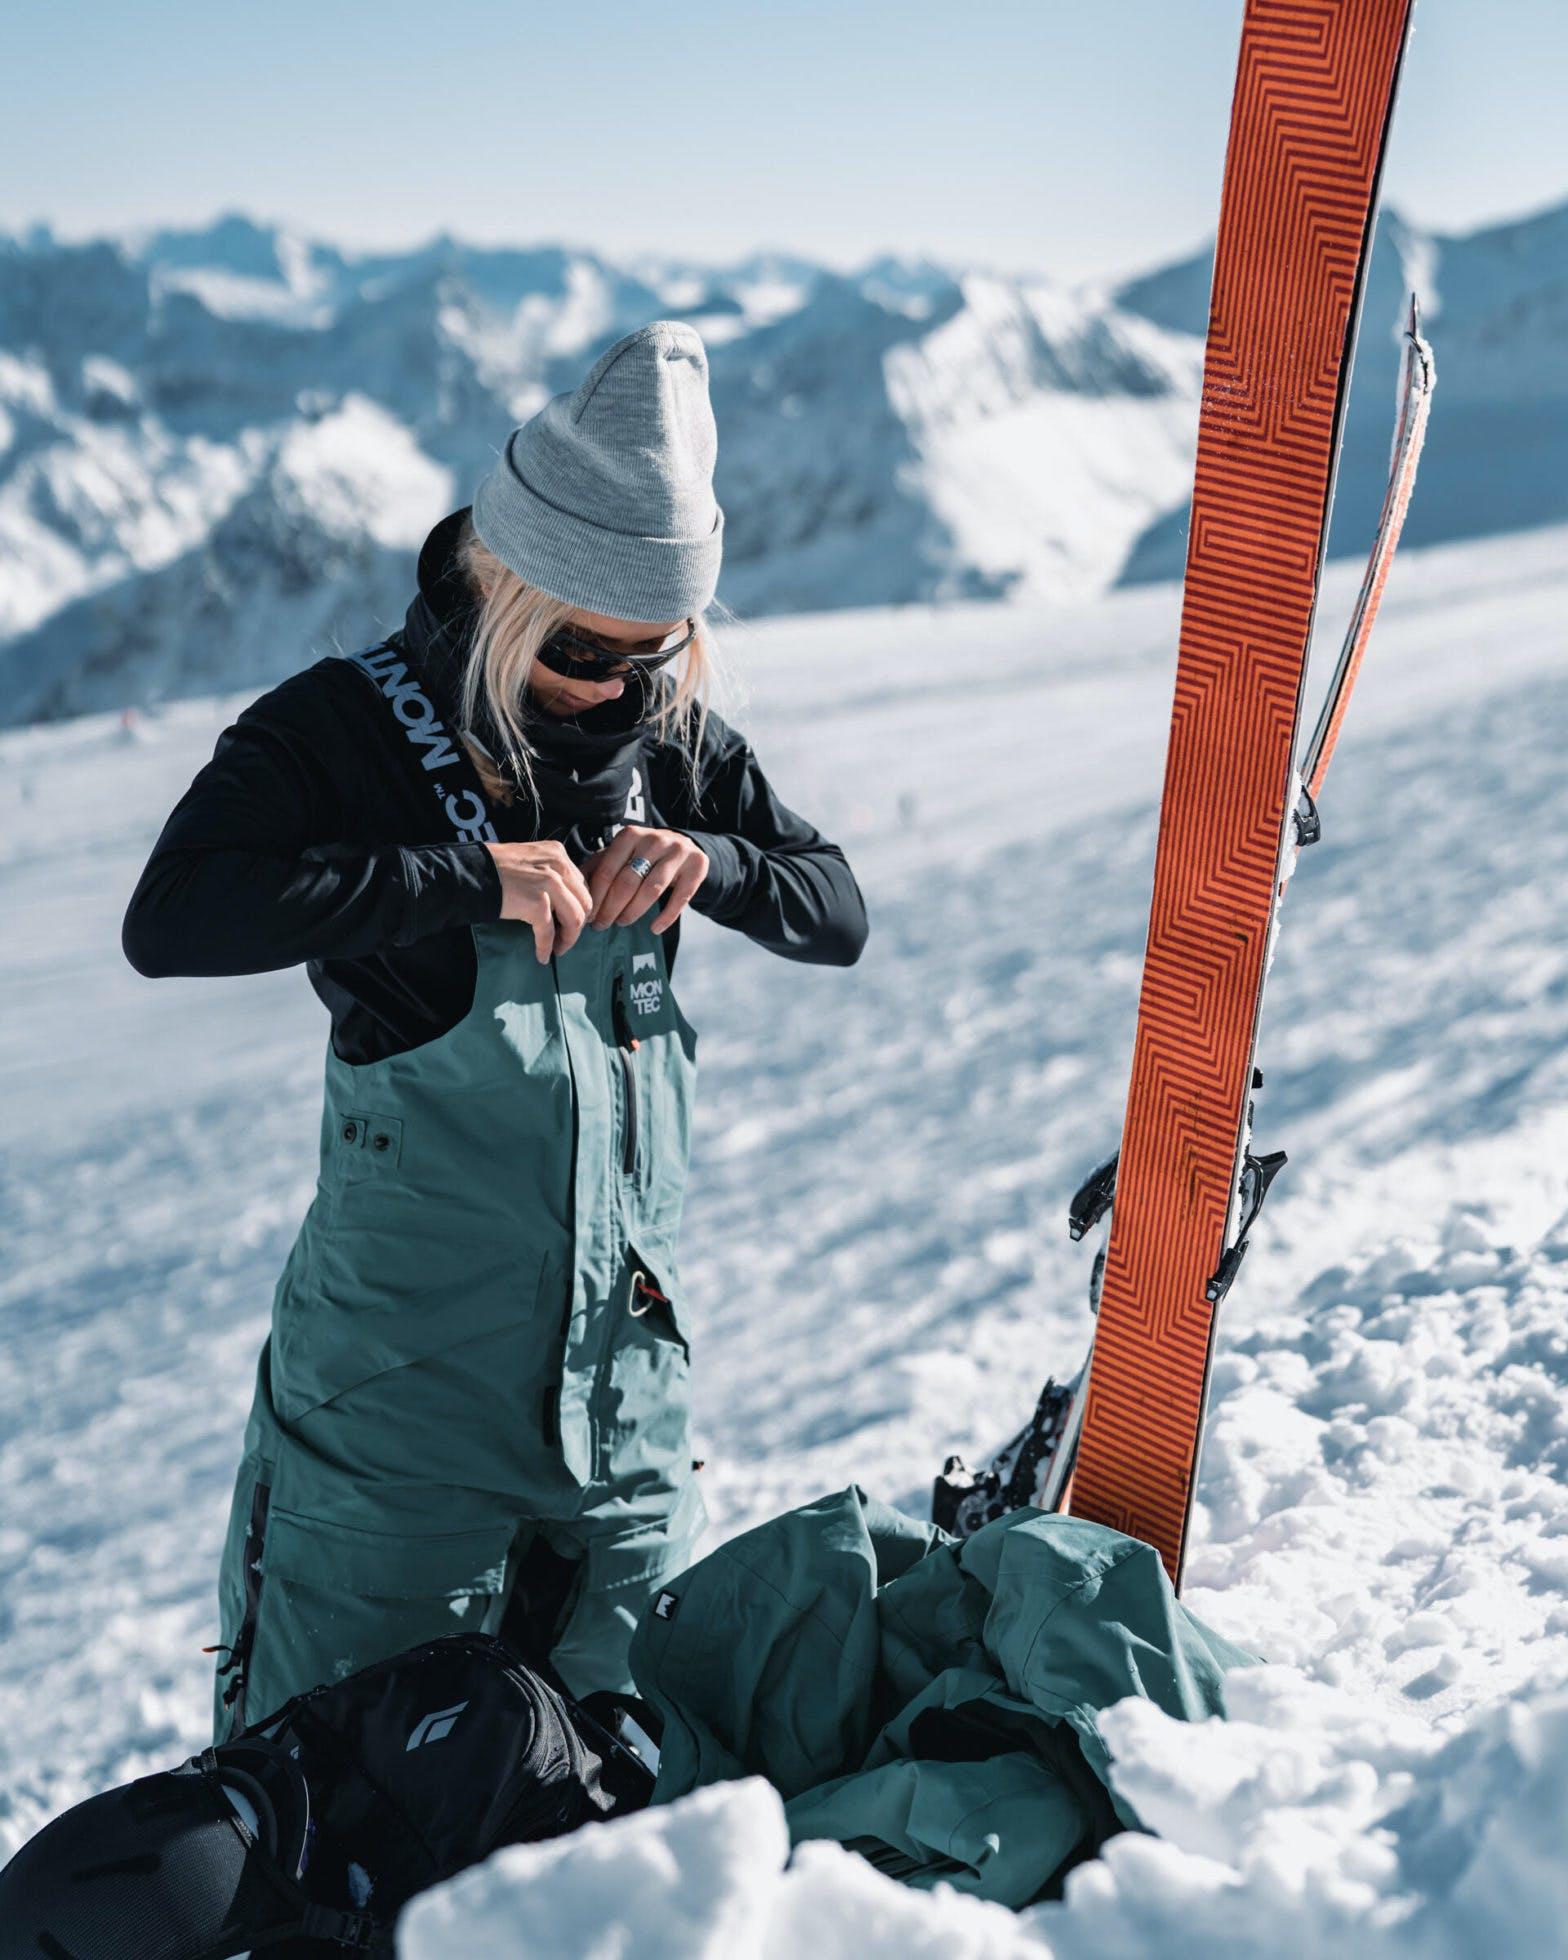 Randonee för nybörjare - Ski touring - Ridestore Magazine